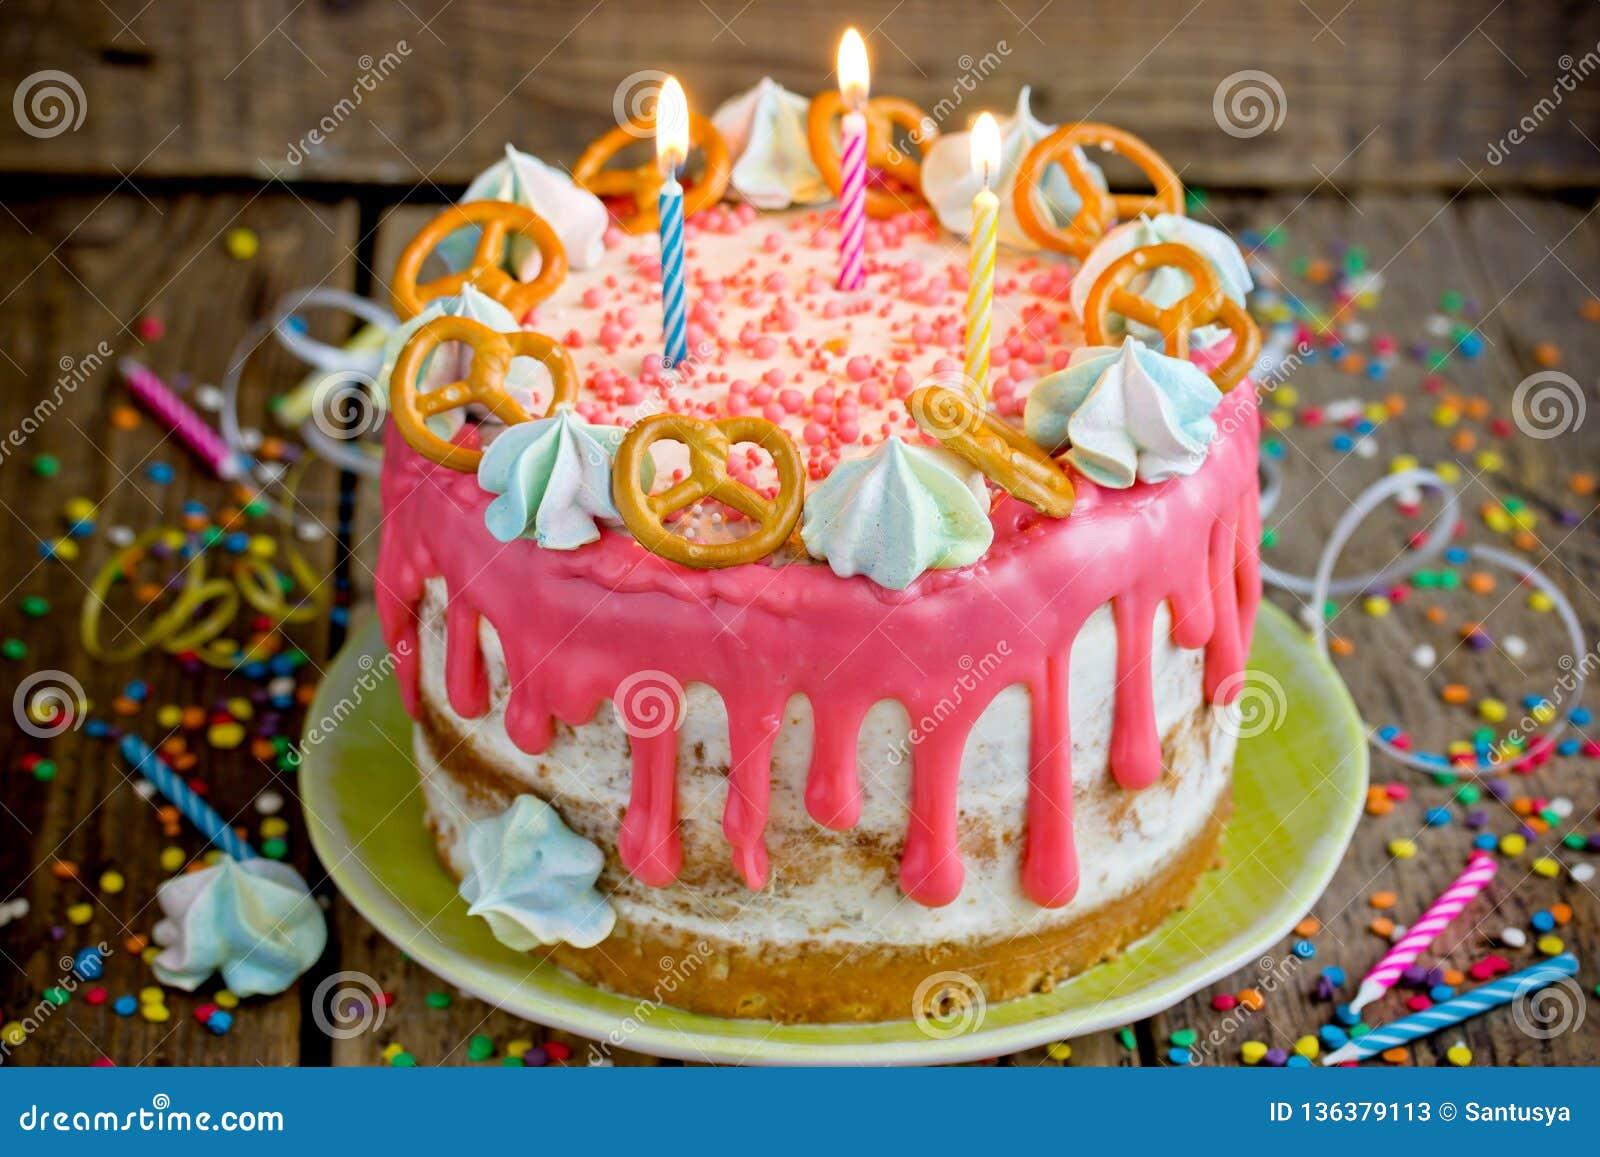 Swell Birthday Cake Celebration Naked Cake With Candles Stock Image Funny Birthday Cards Online Elaedamsfinfo